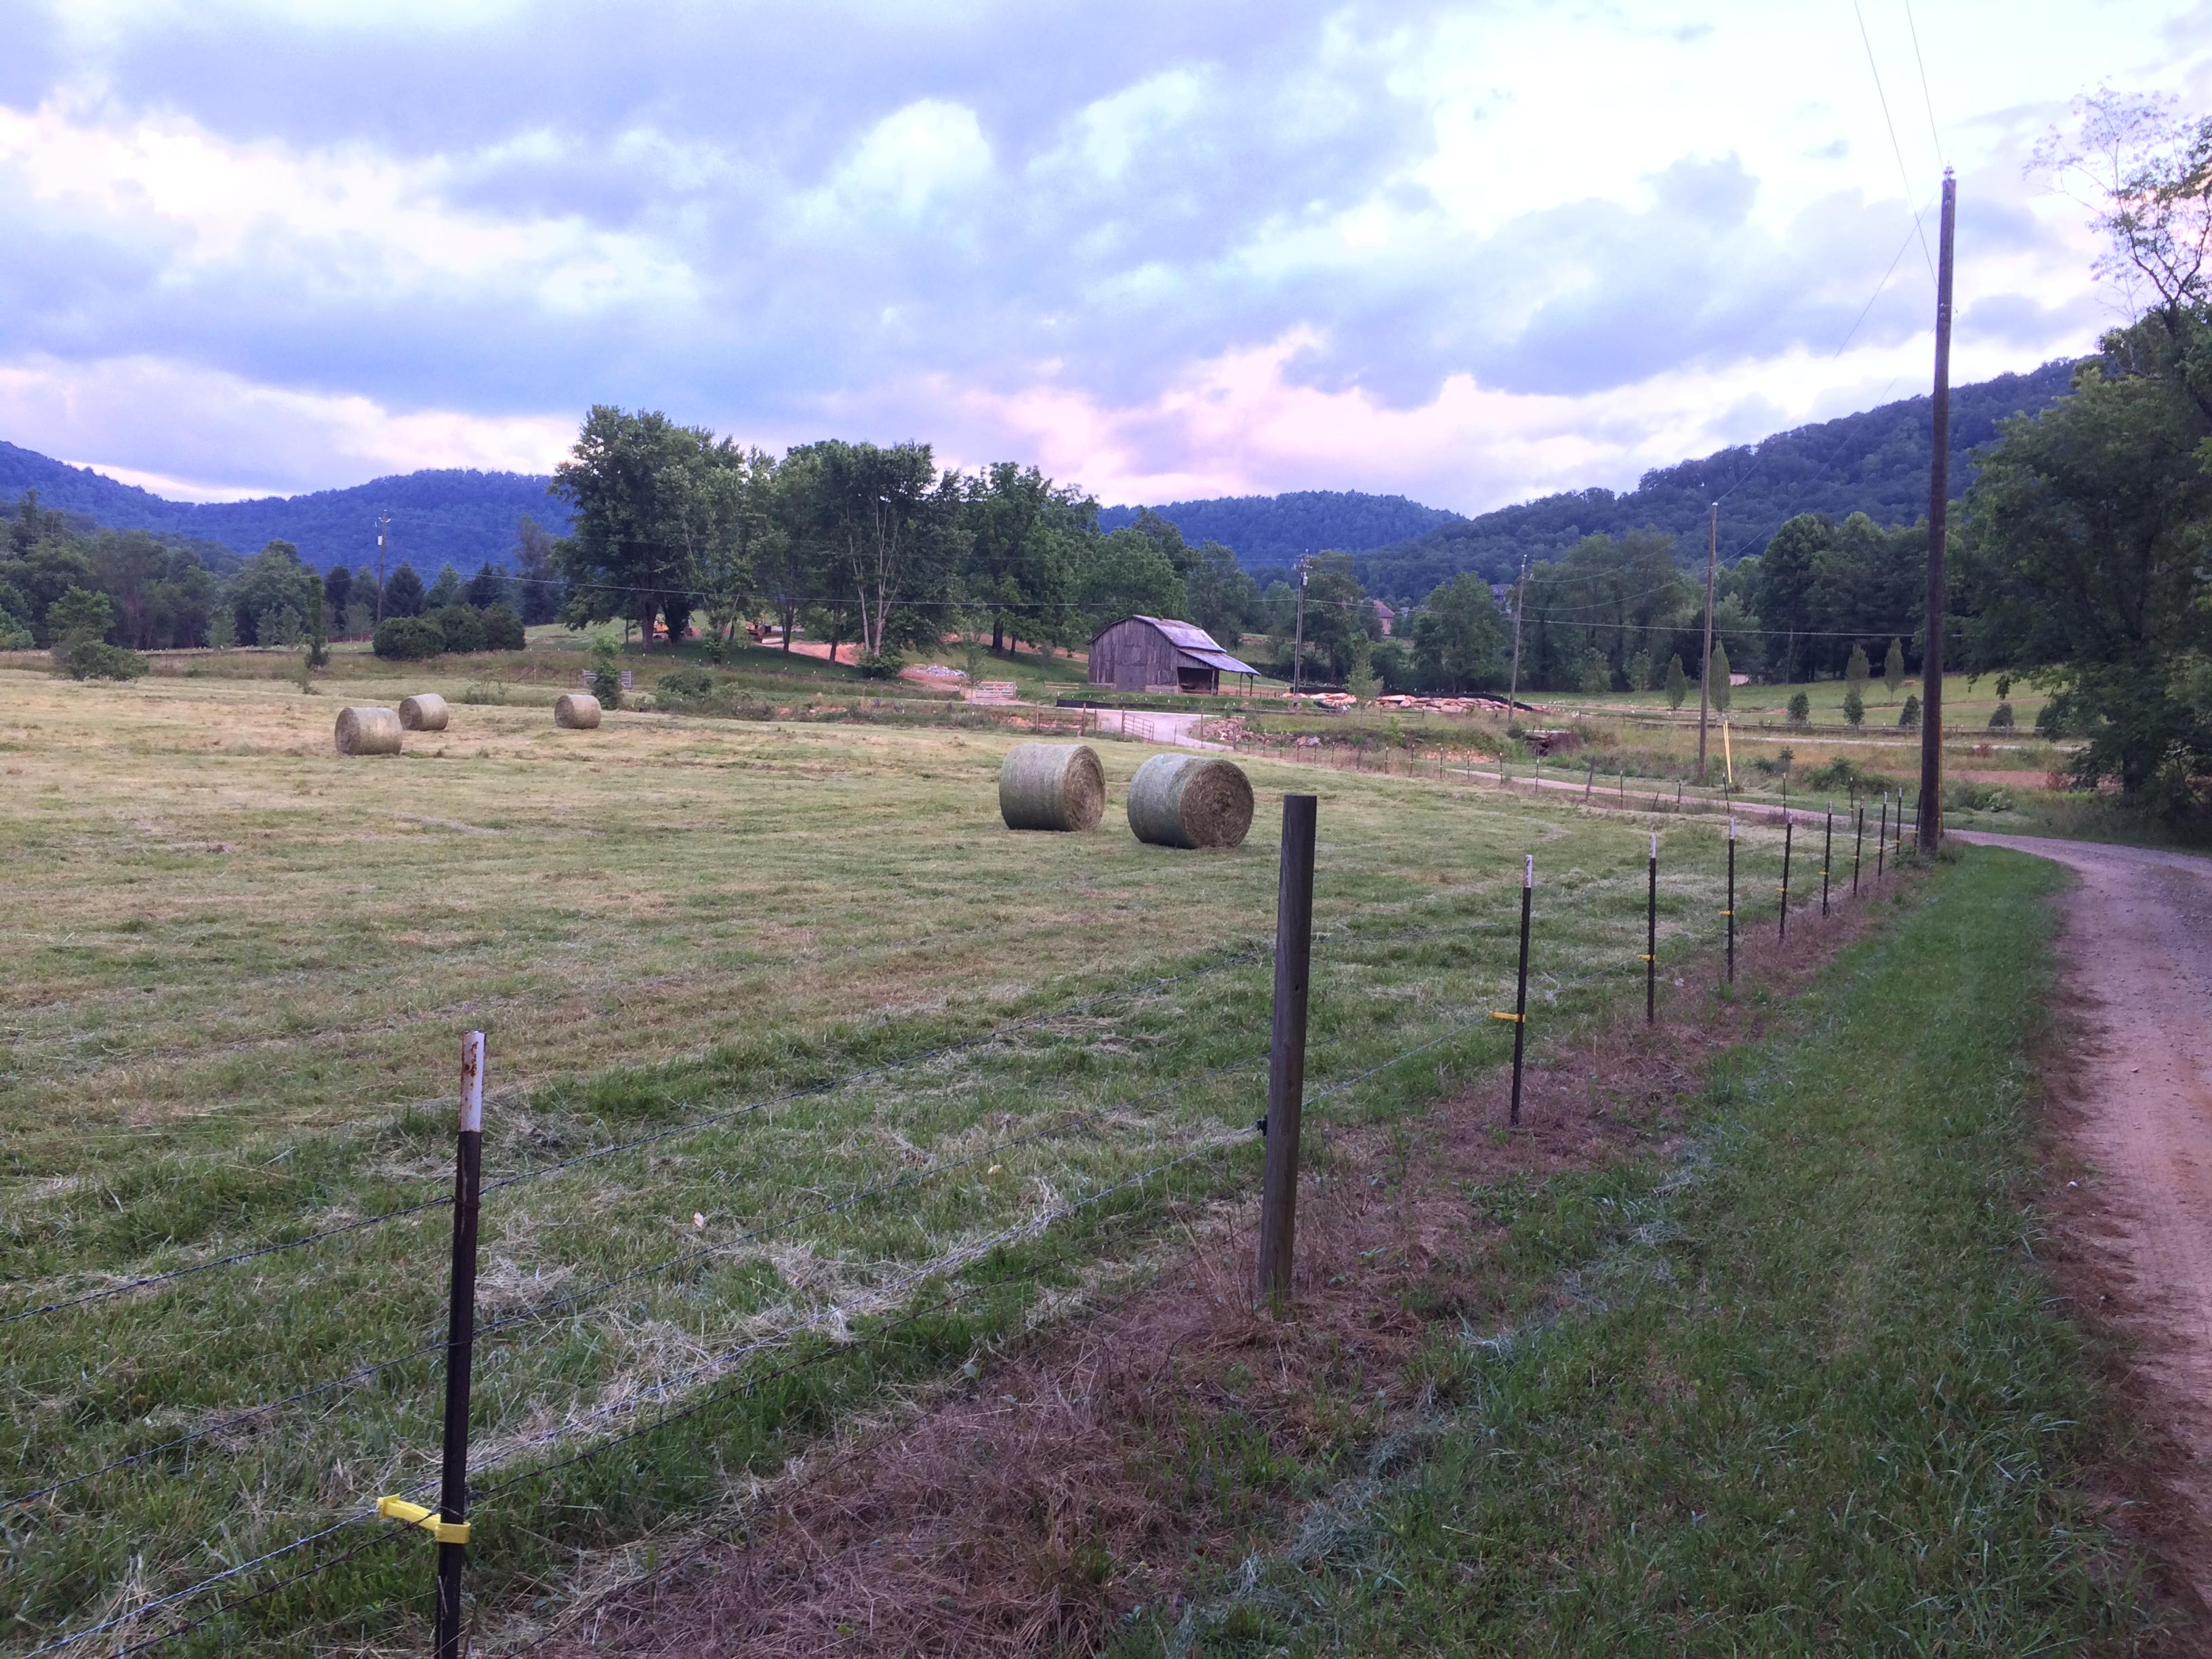 Hay bales June 10